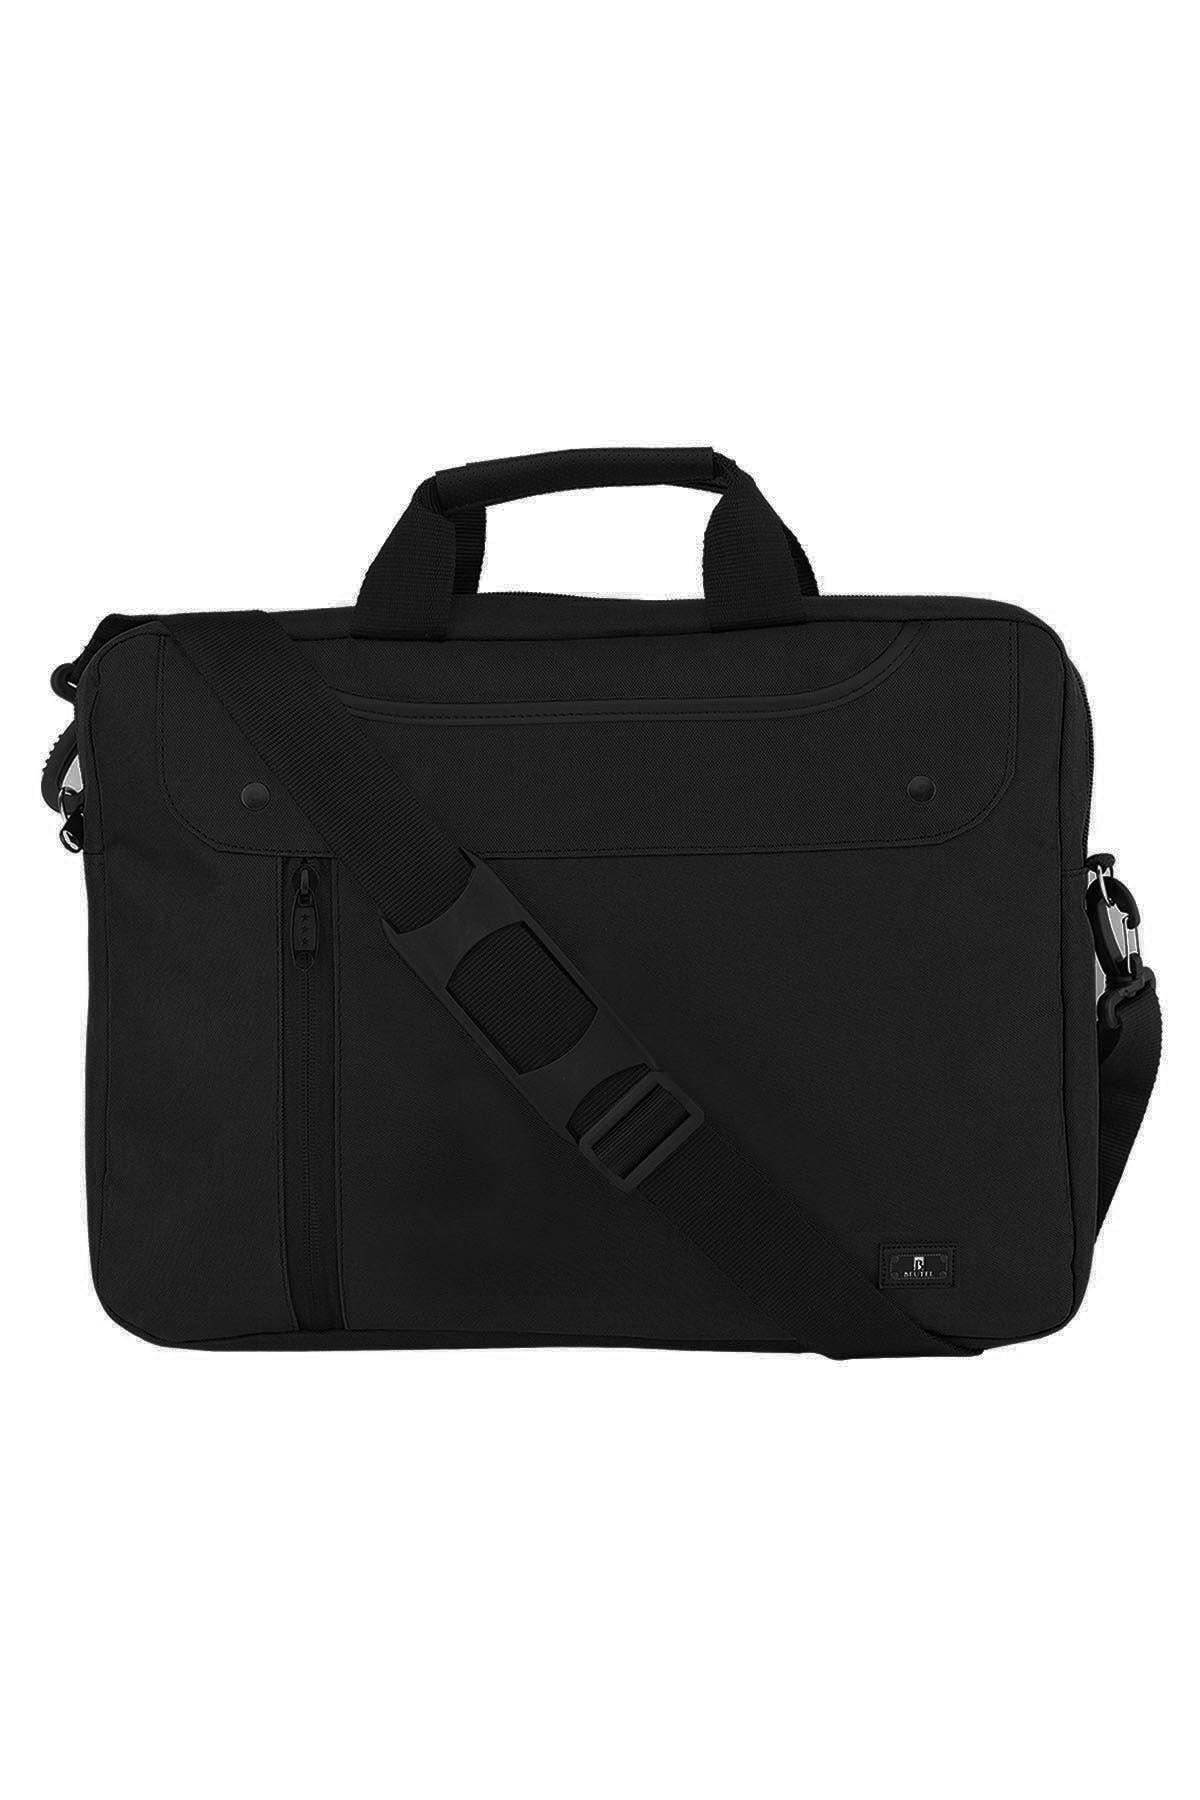 Beutel Unisex Siyah Evrak Notebook Laptop Çantası Nls500 15.6 1